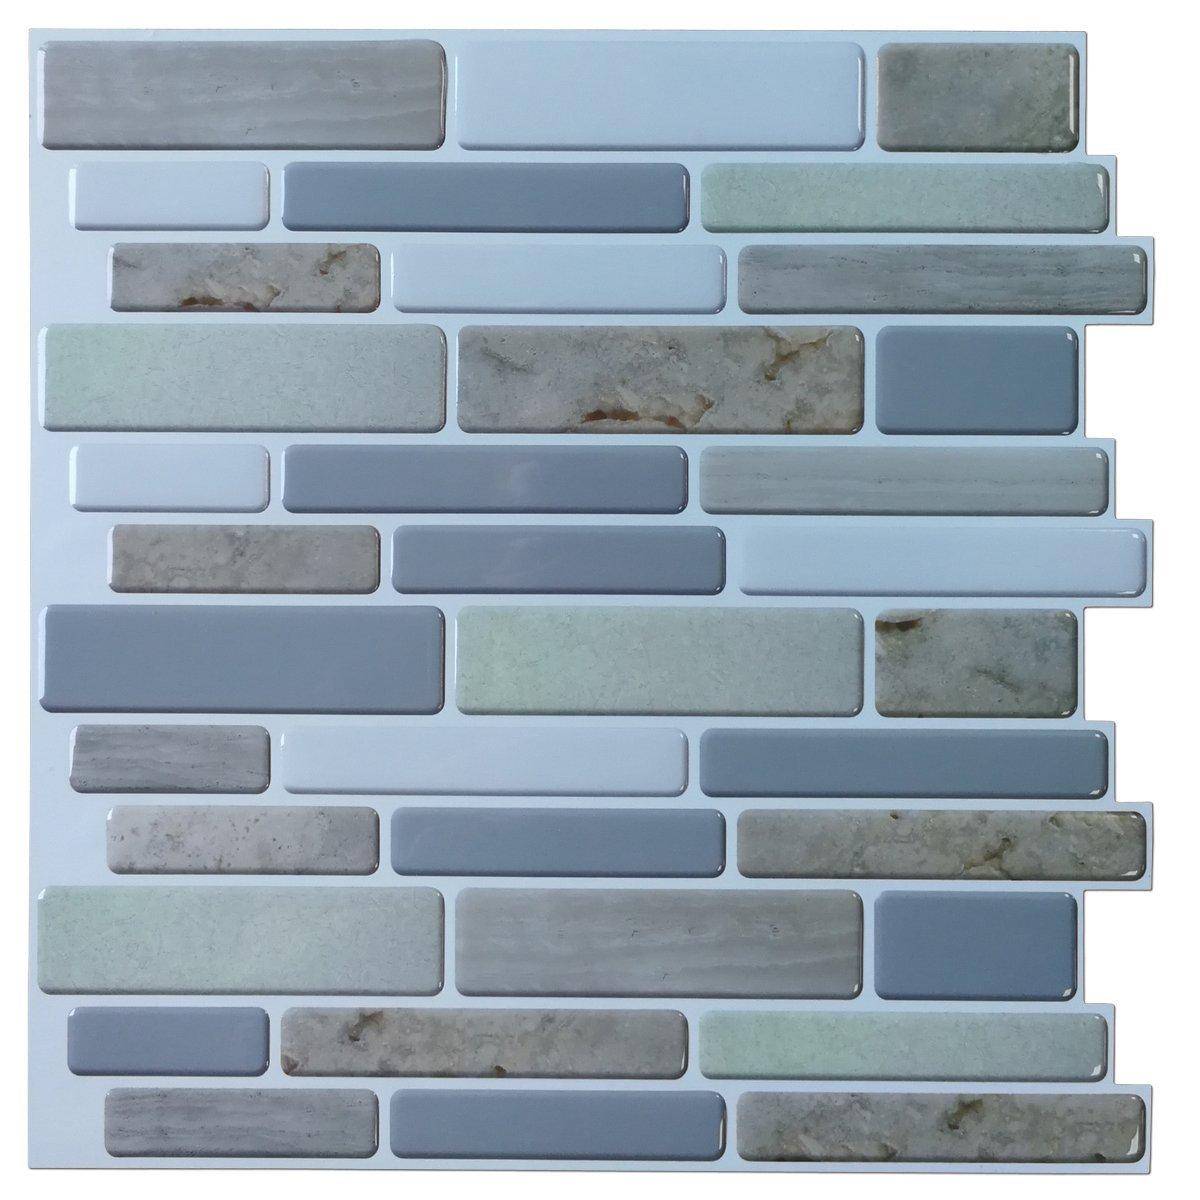 "Art3d 12""x12"" Peel and Stick Backsplah Tile Self Adhesive Mosaic Backsplash for Kitchen, Jade Design (6 Pack)"